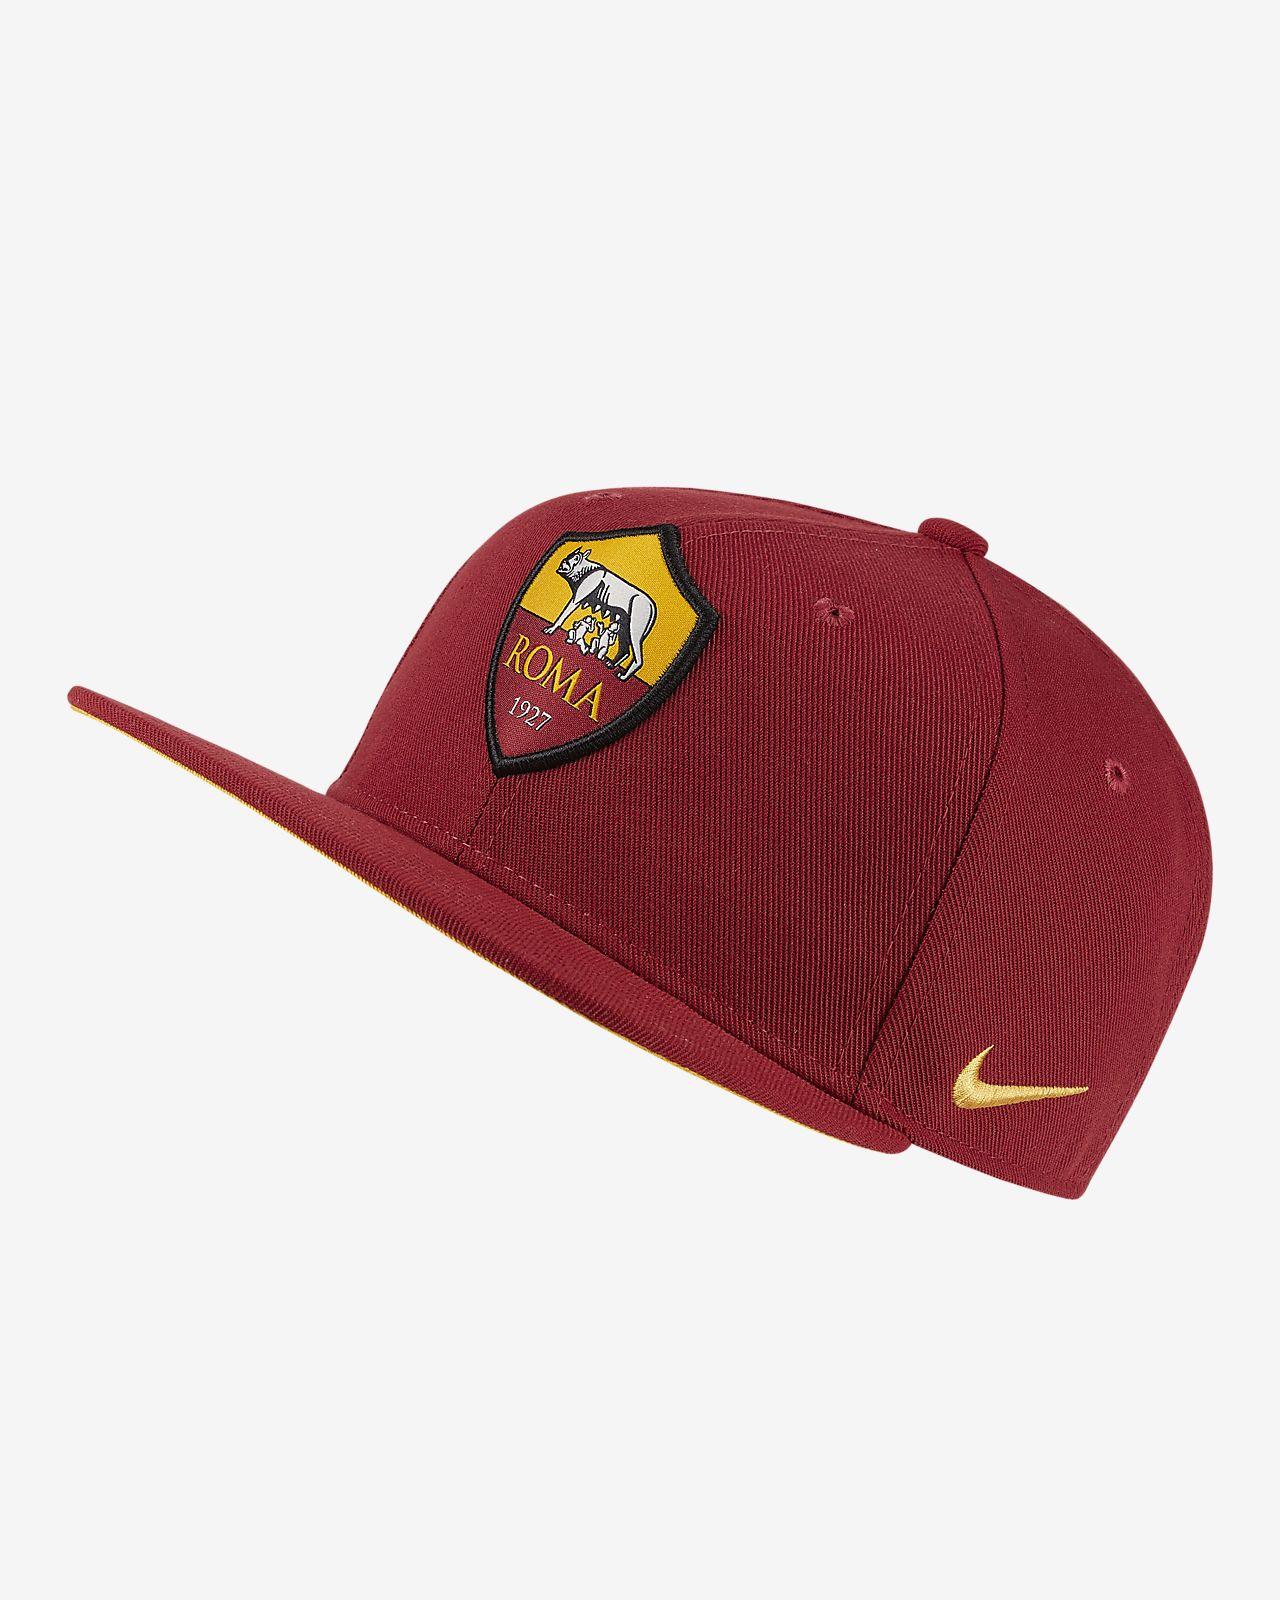 Nike Pro A.S. Rom verstellbare Cap für ältere Kinder